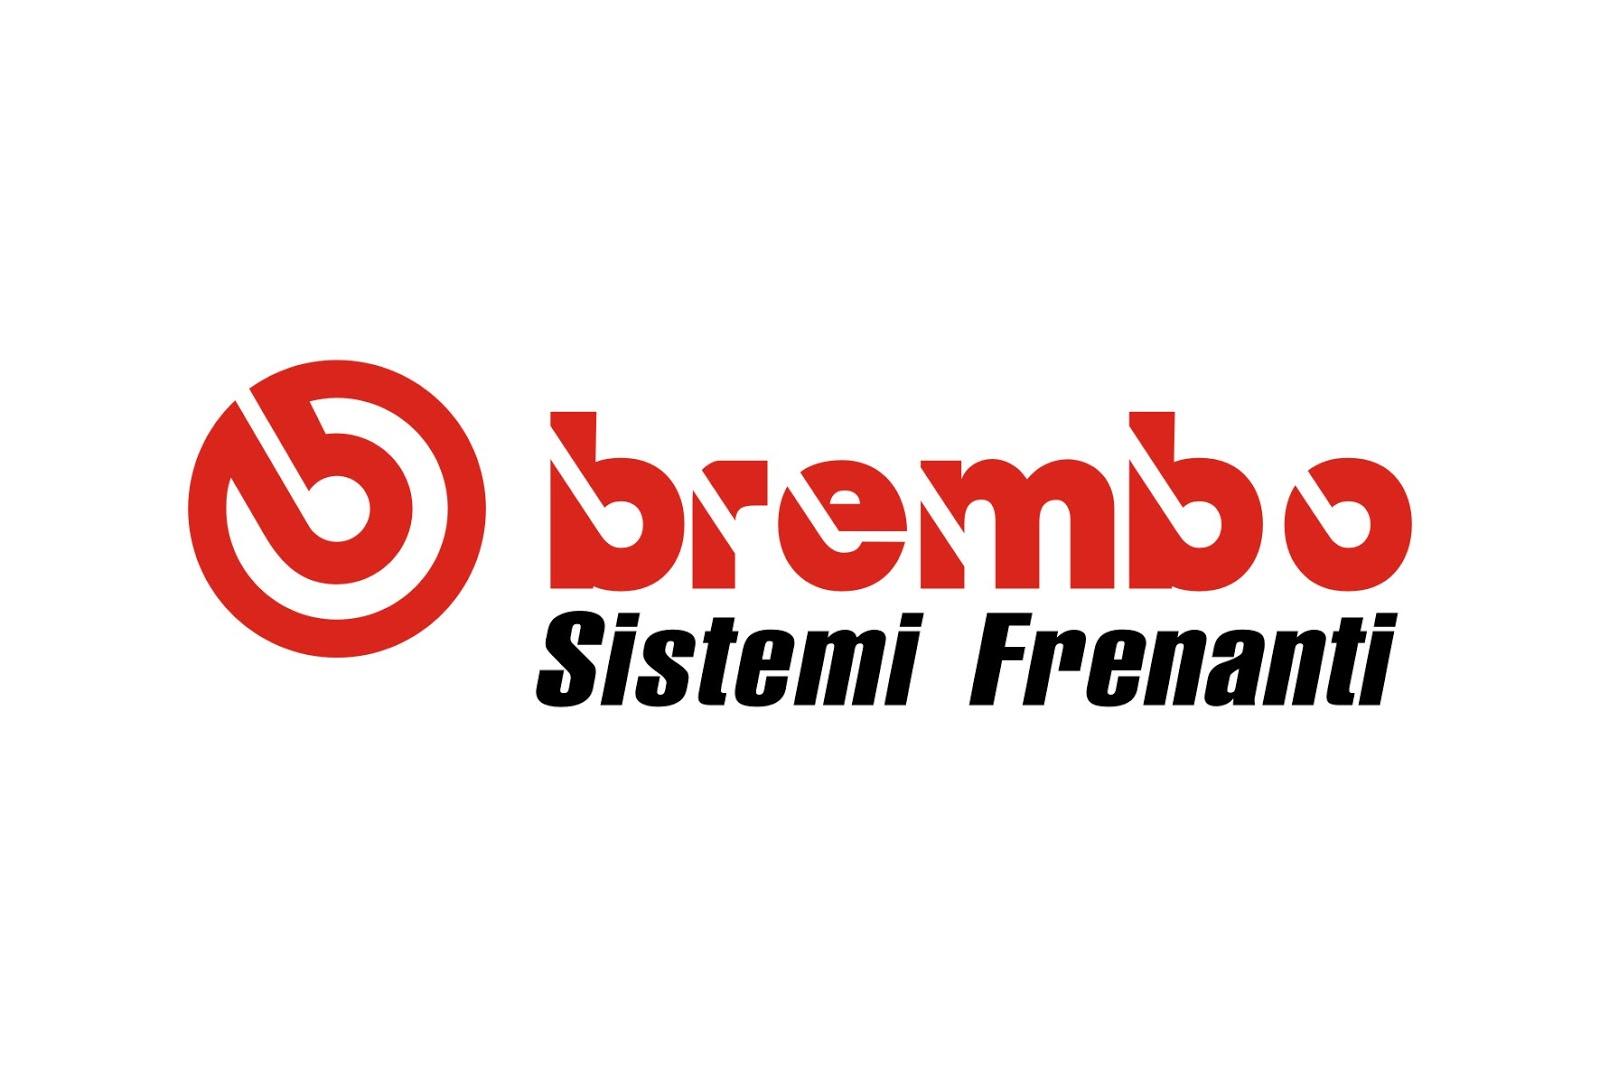 brembo logo logoshare